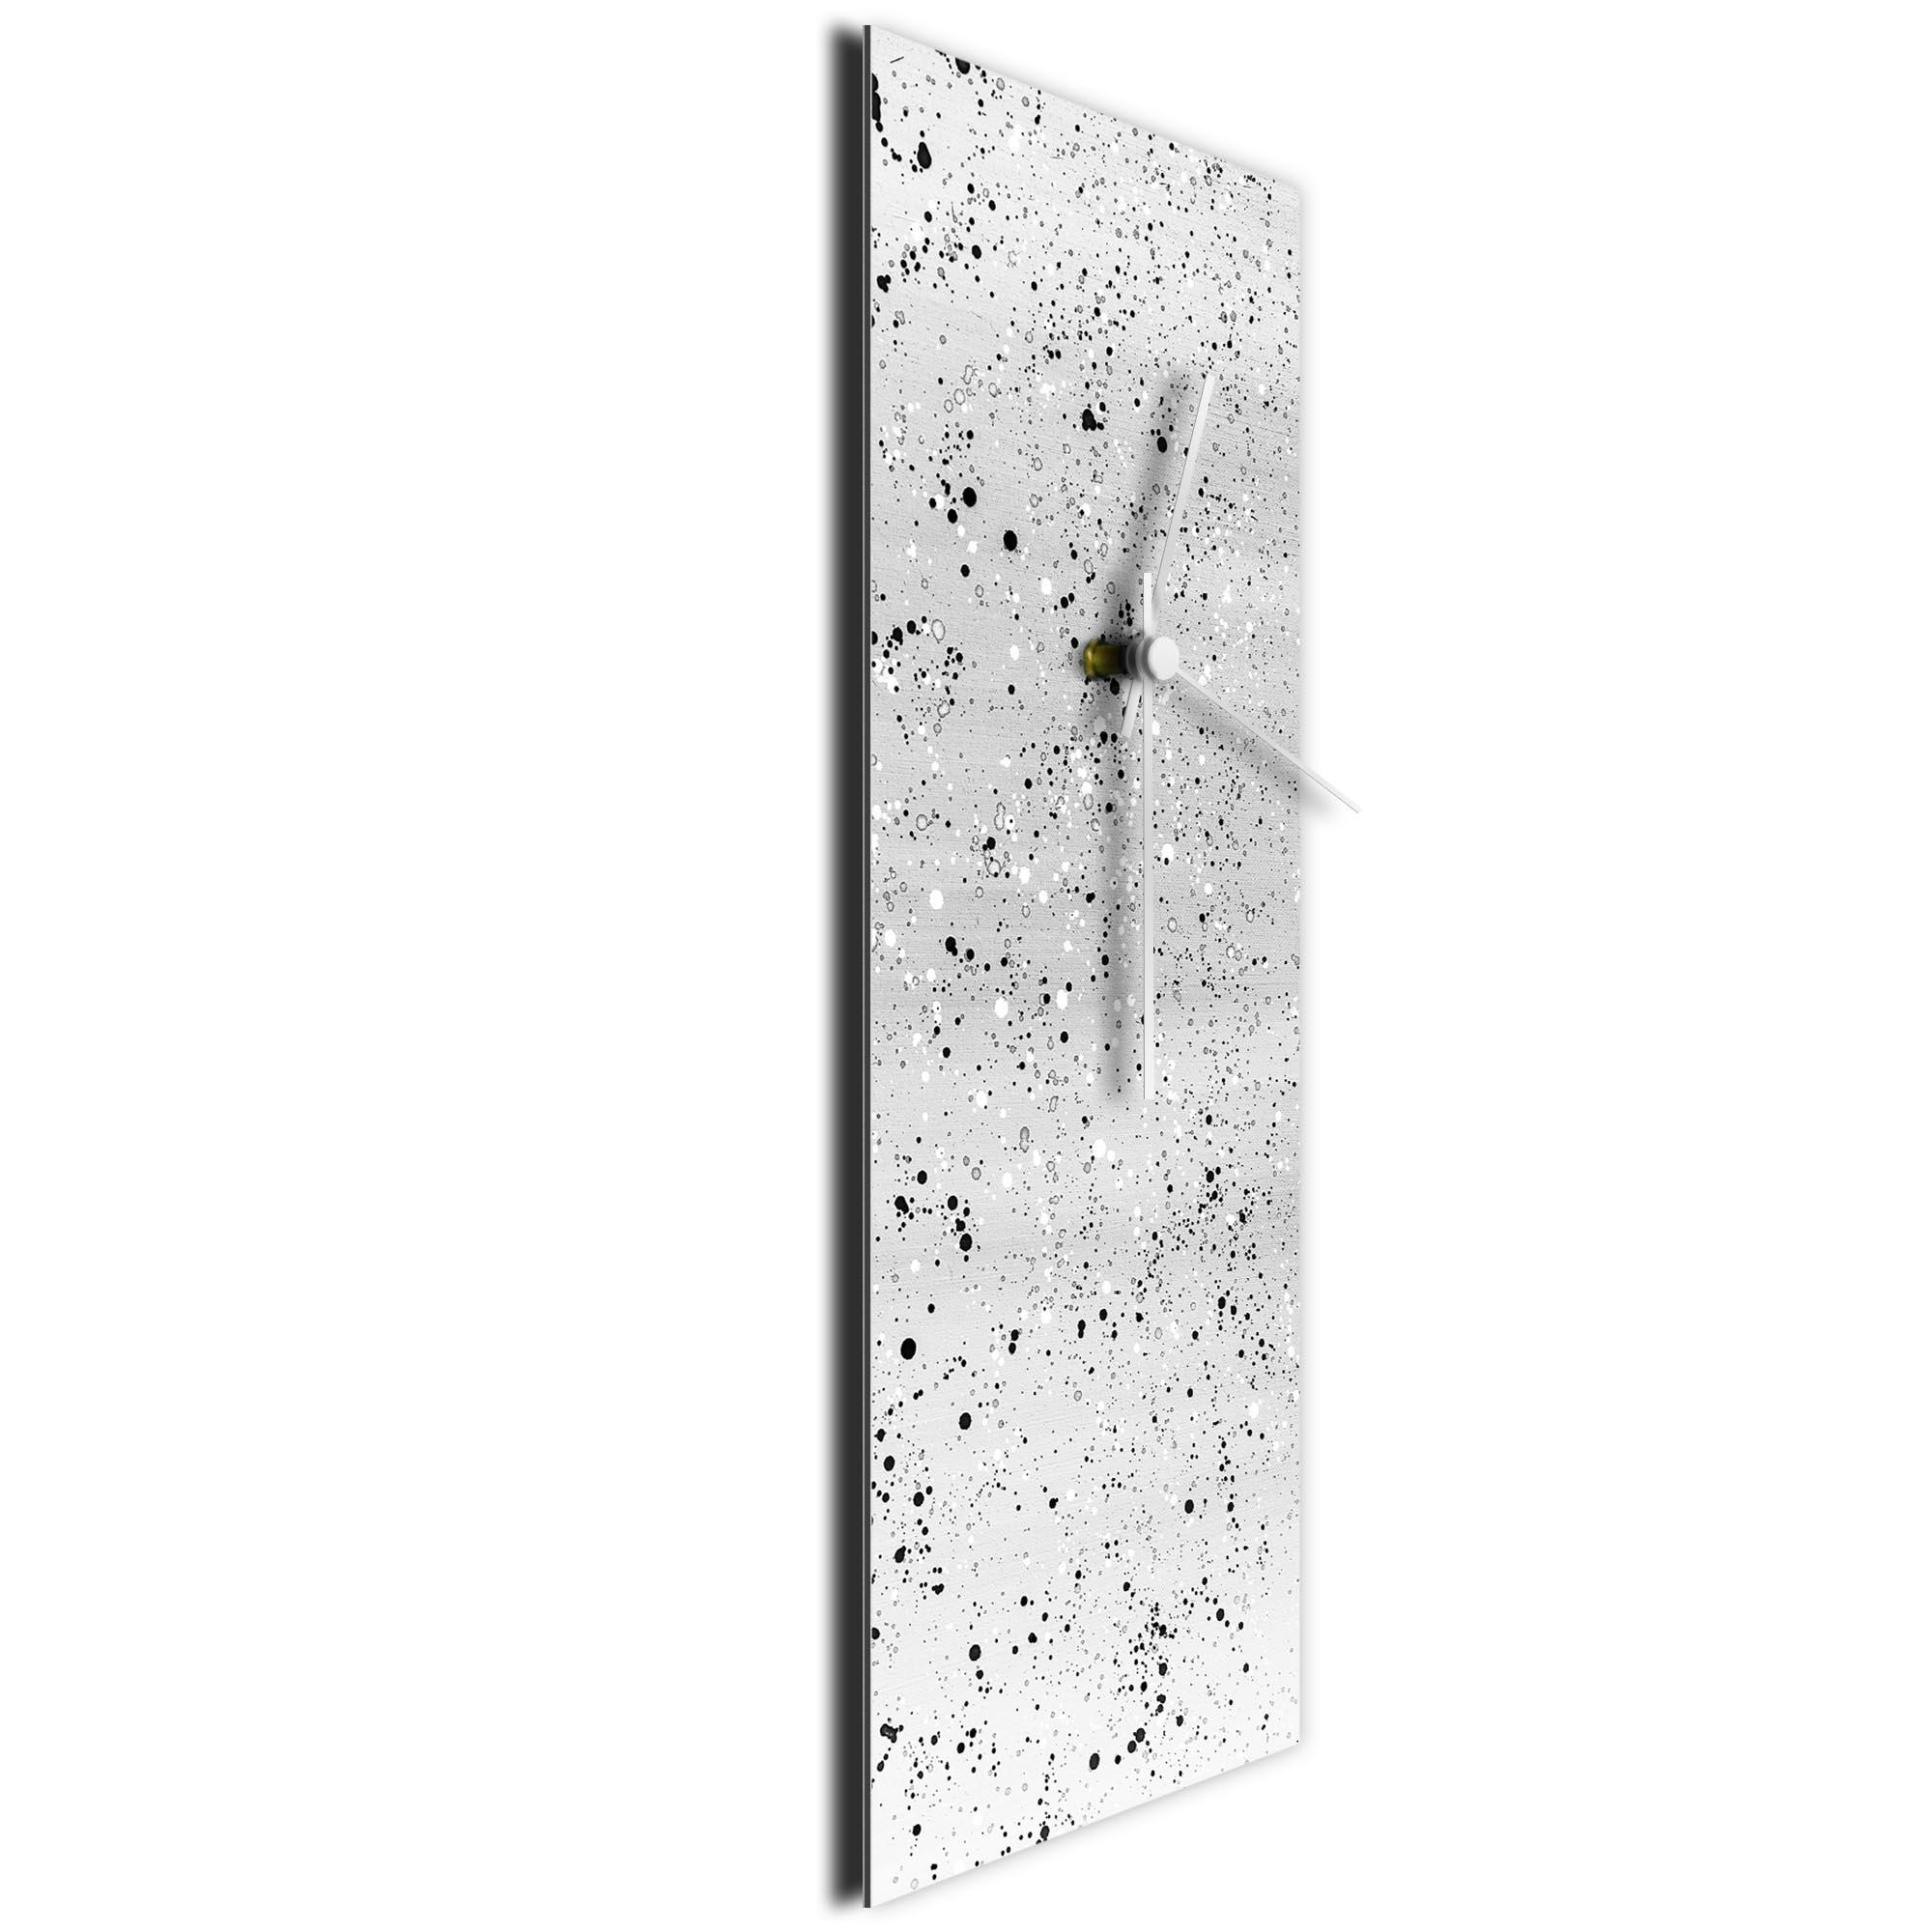 White Flecked Clock Large by Mendo Vasilevski - Urban Abstract Home Decor - Image 3